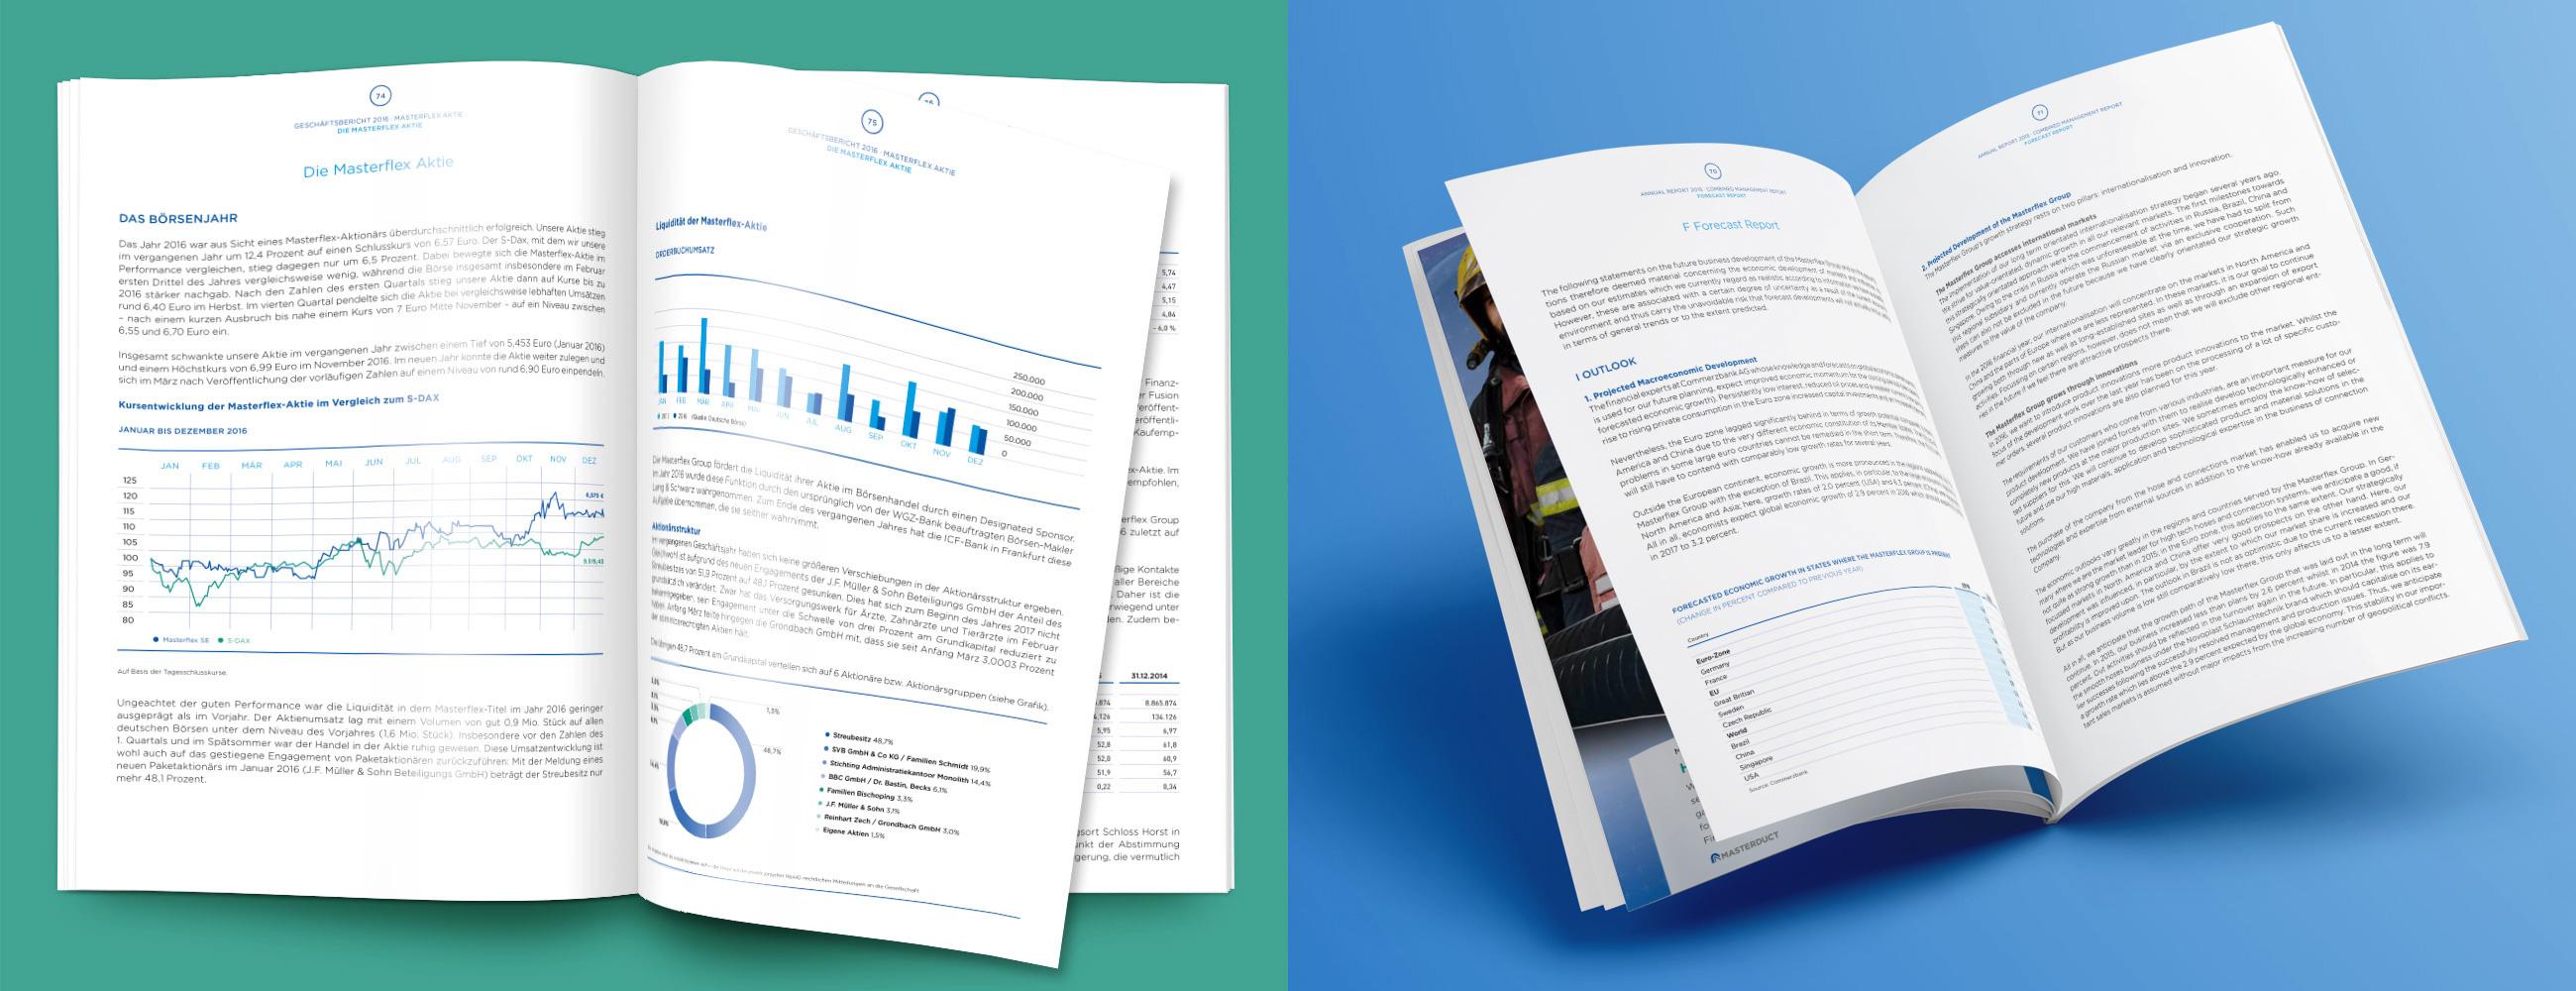 Geschäftsbericht Masterflex